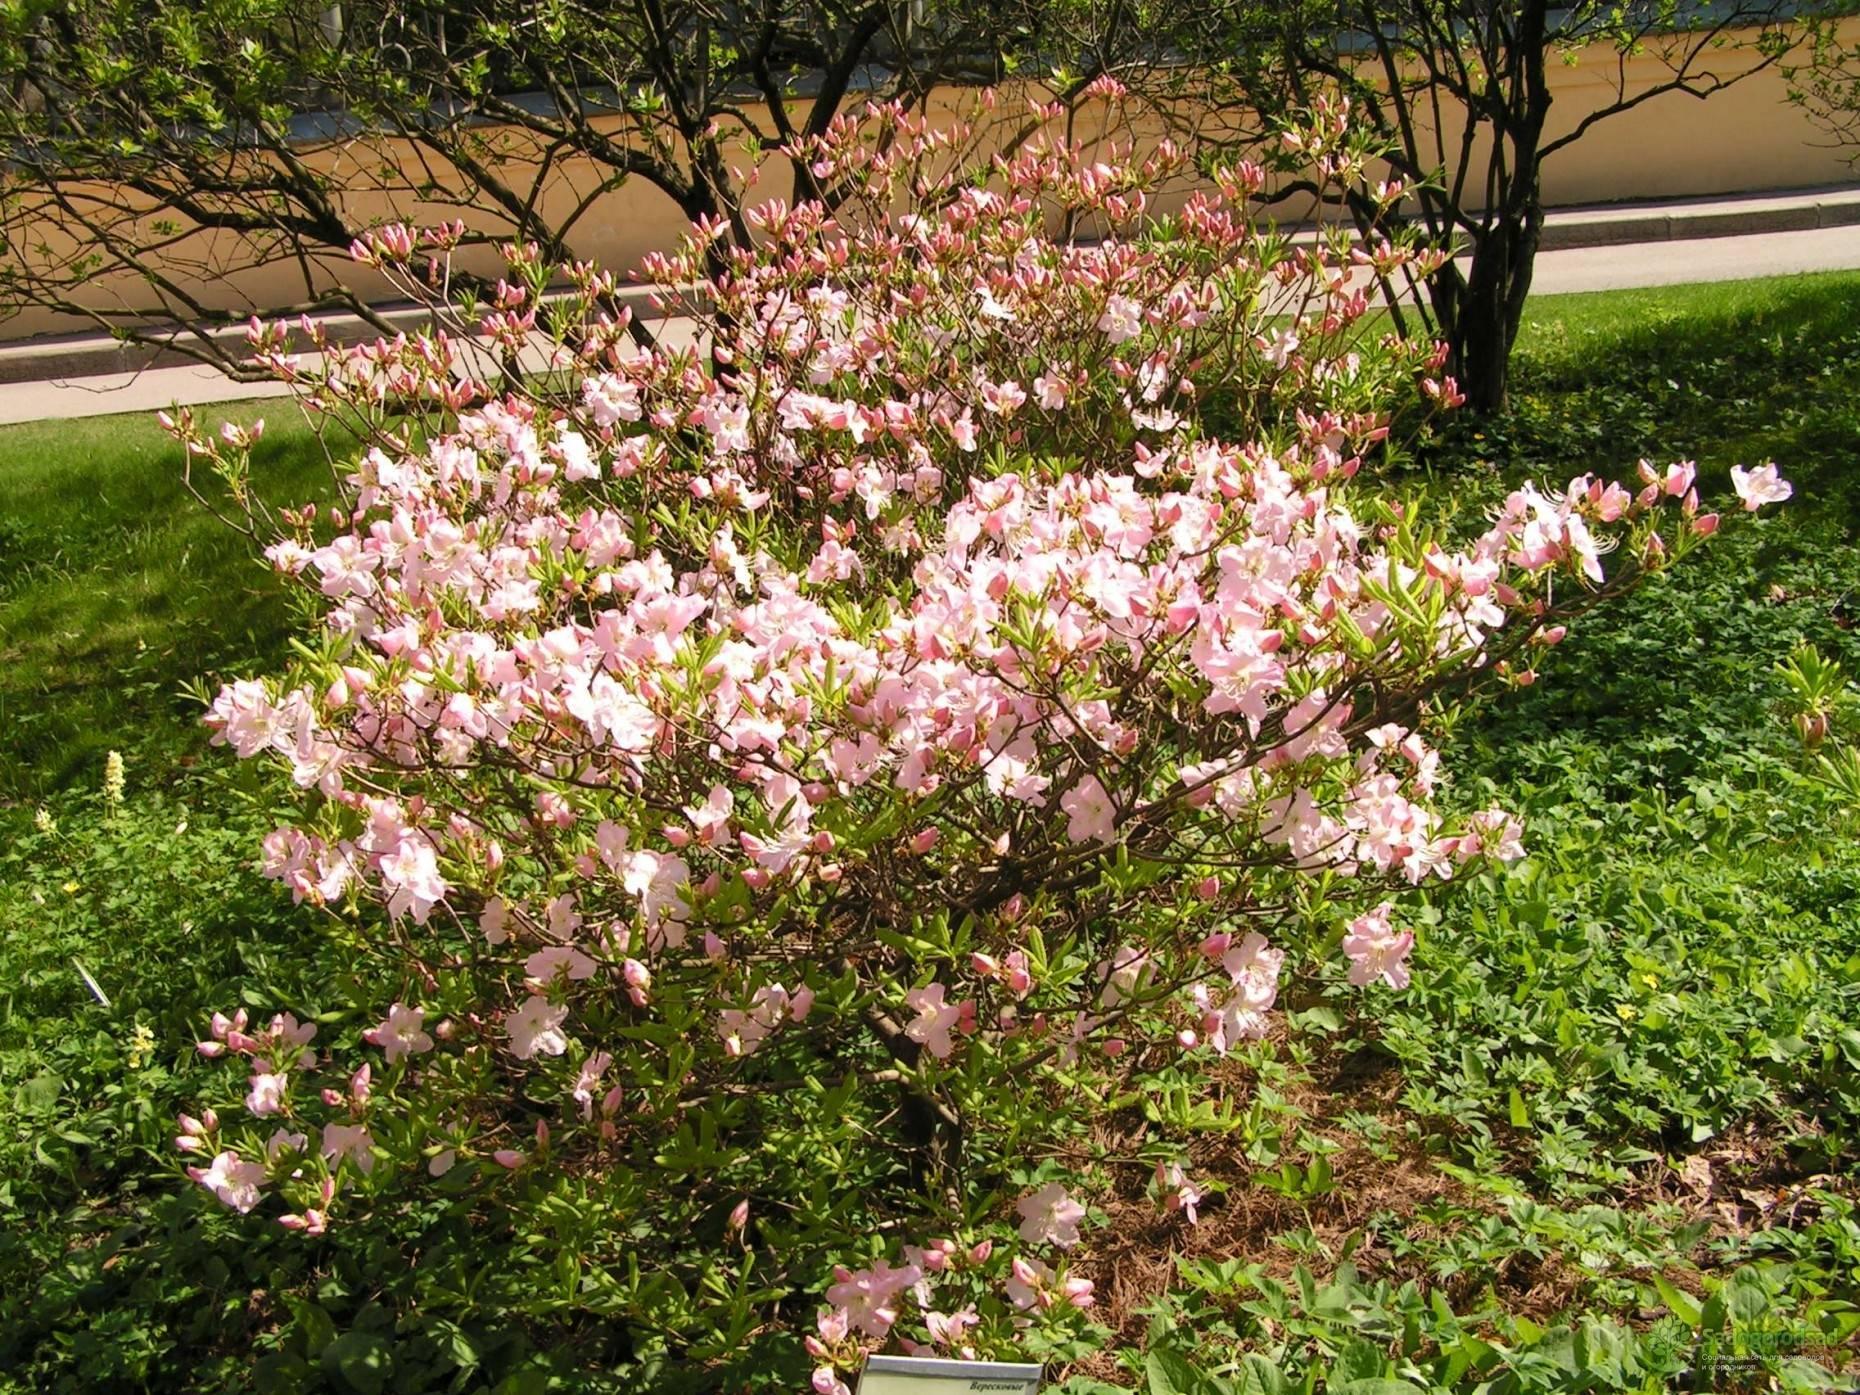 Рододендрон шлиппенбаха (27 фото): выращивание «розового дерева» из семян, его описание. правила посадки и ухода